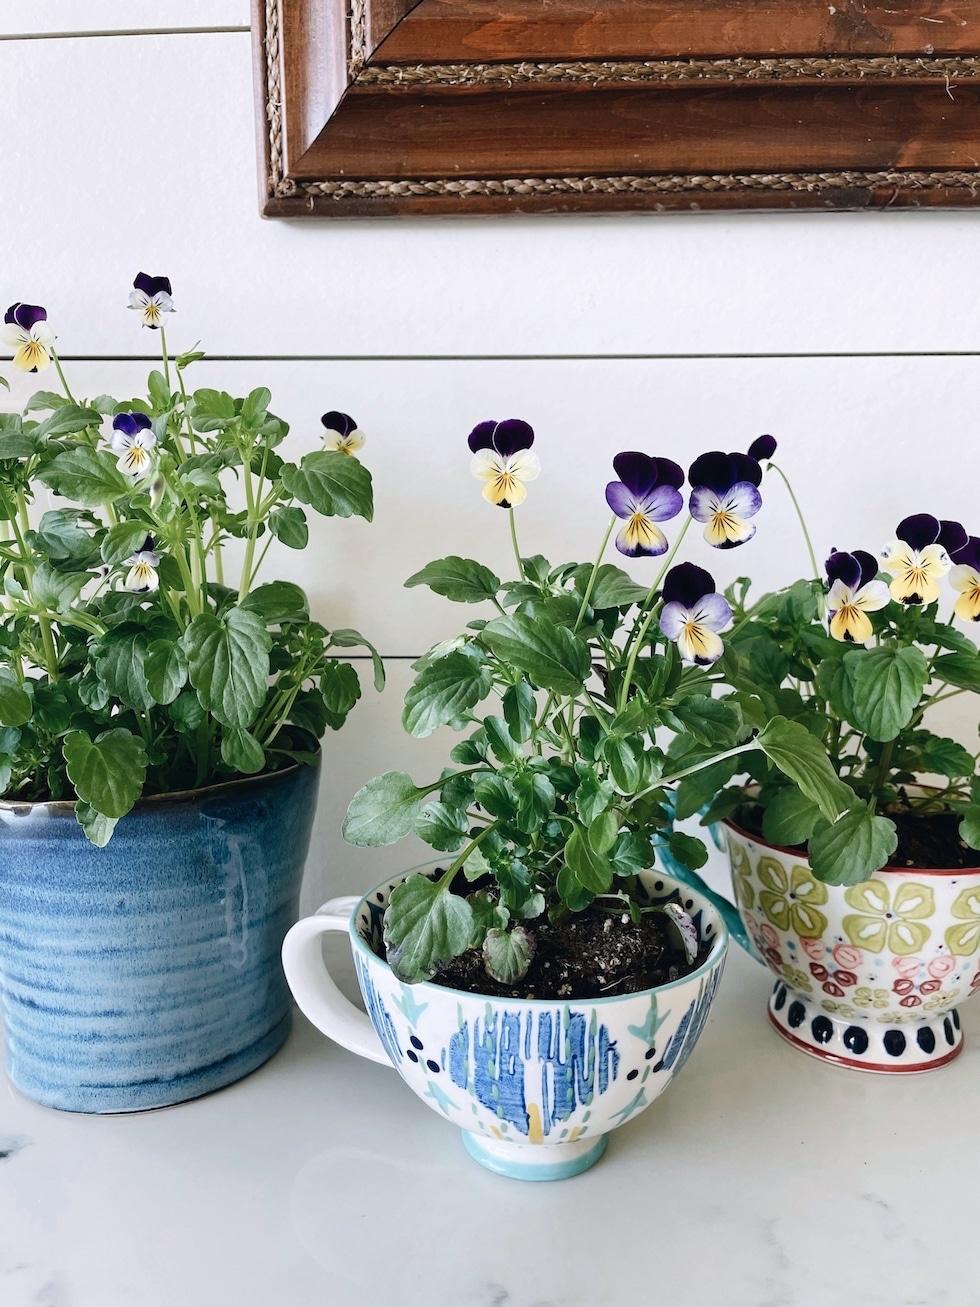 Edible Flower Teacup Garden in the Kitchen